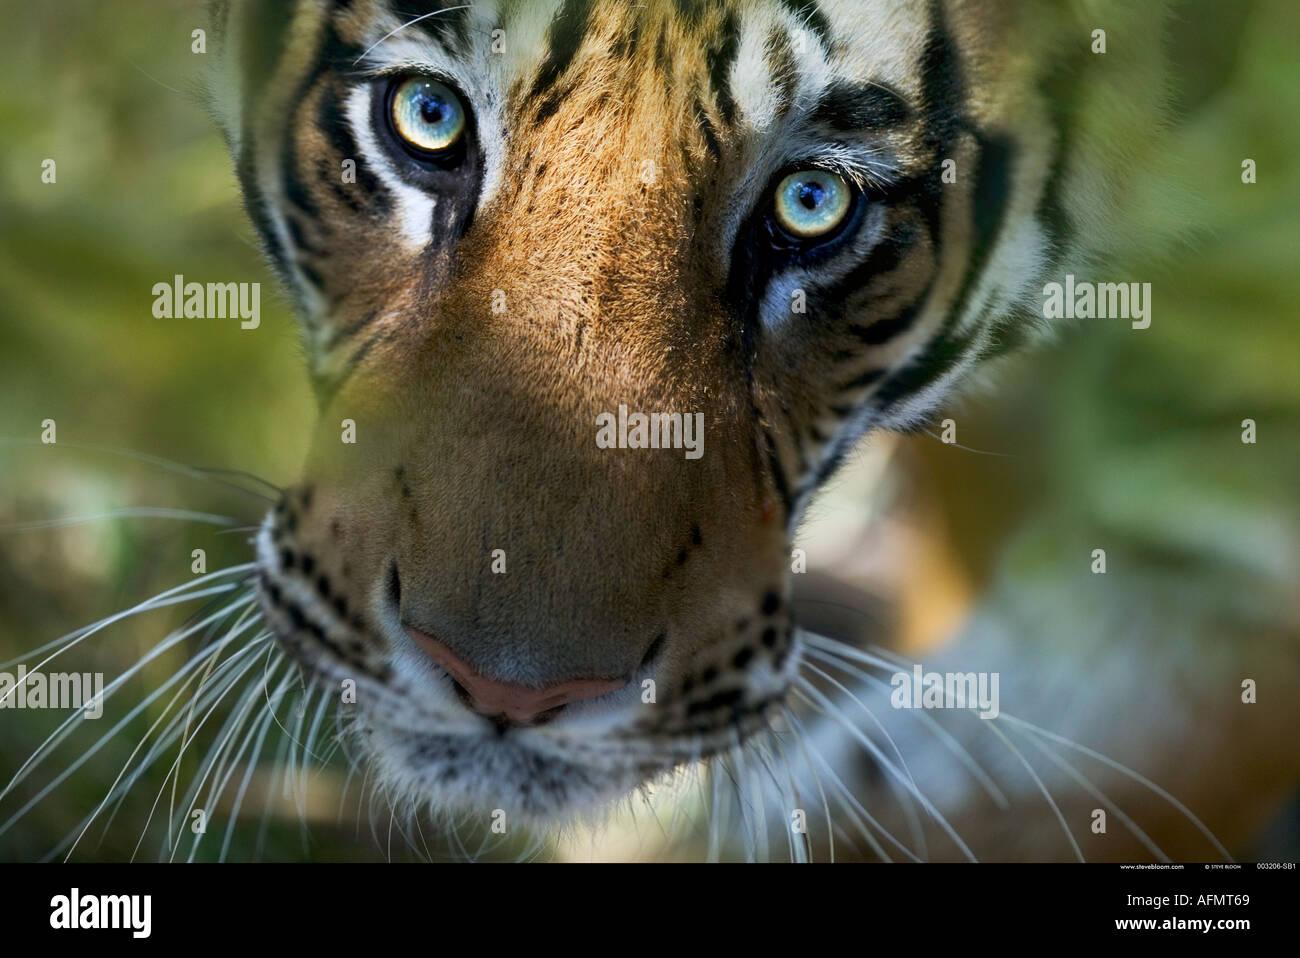 Tigre del Bengala cercando Bandhavgarh India Foto Stock